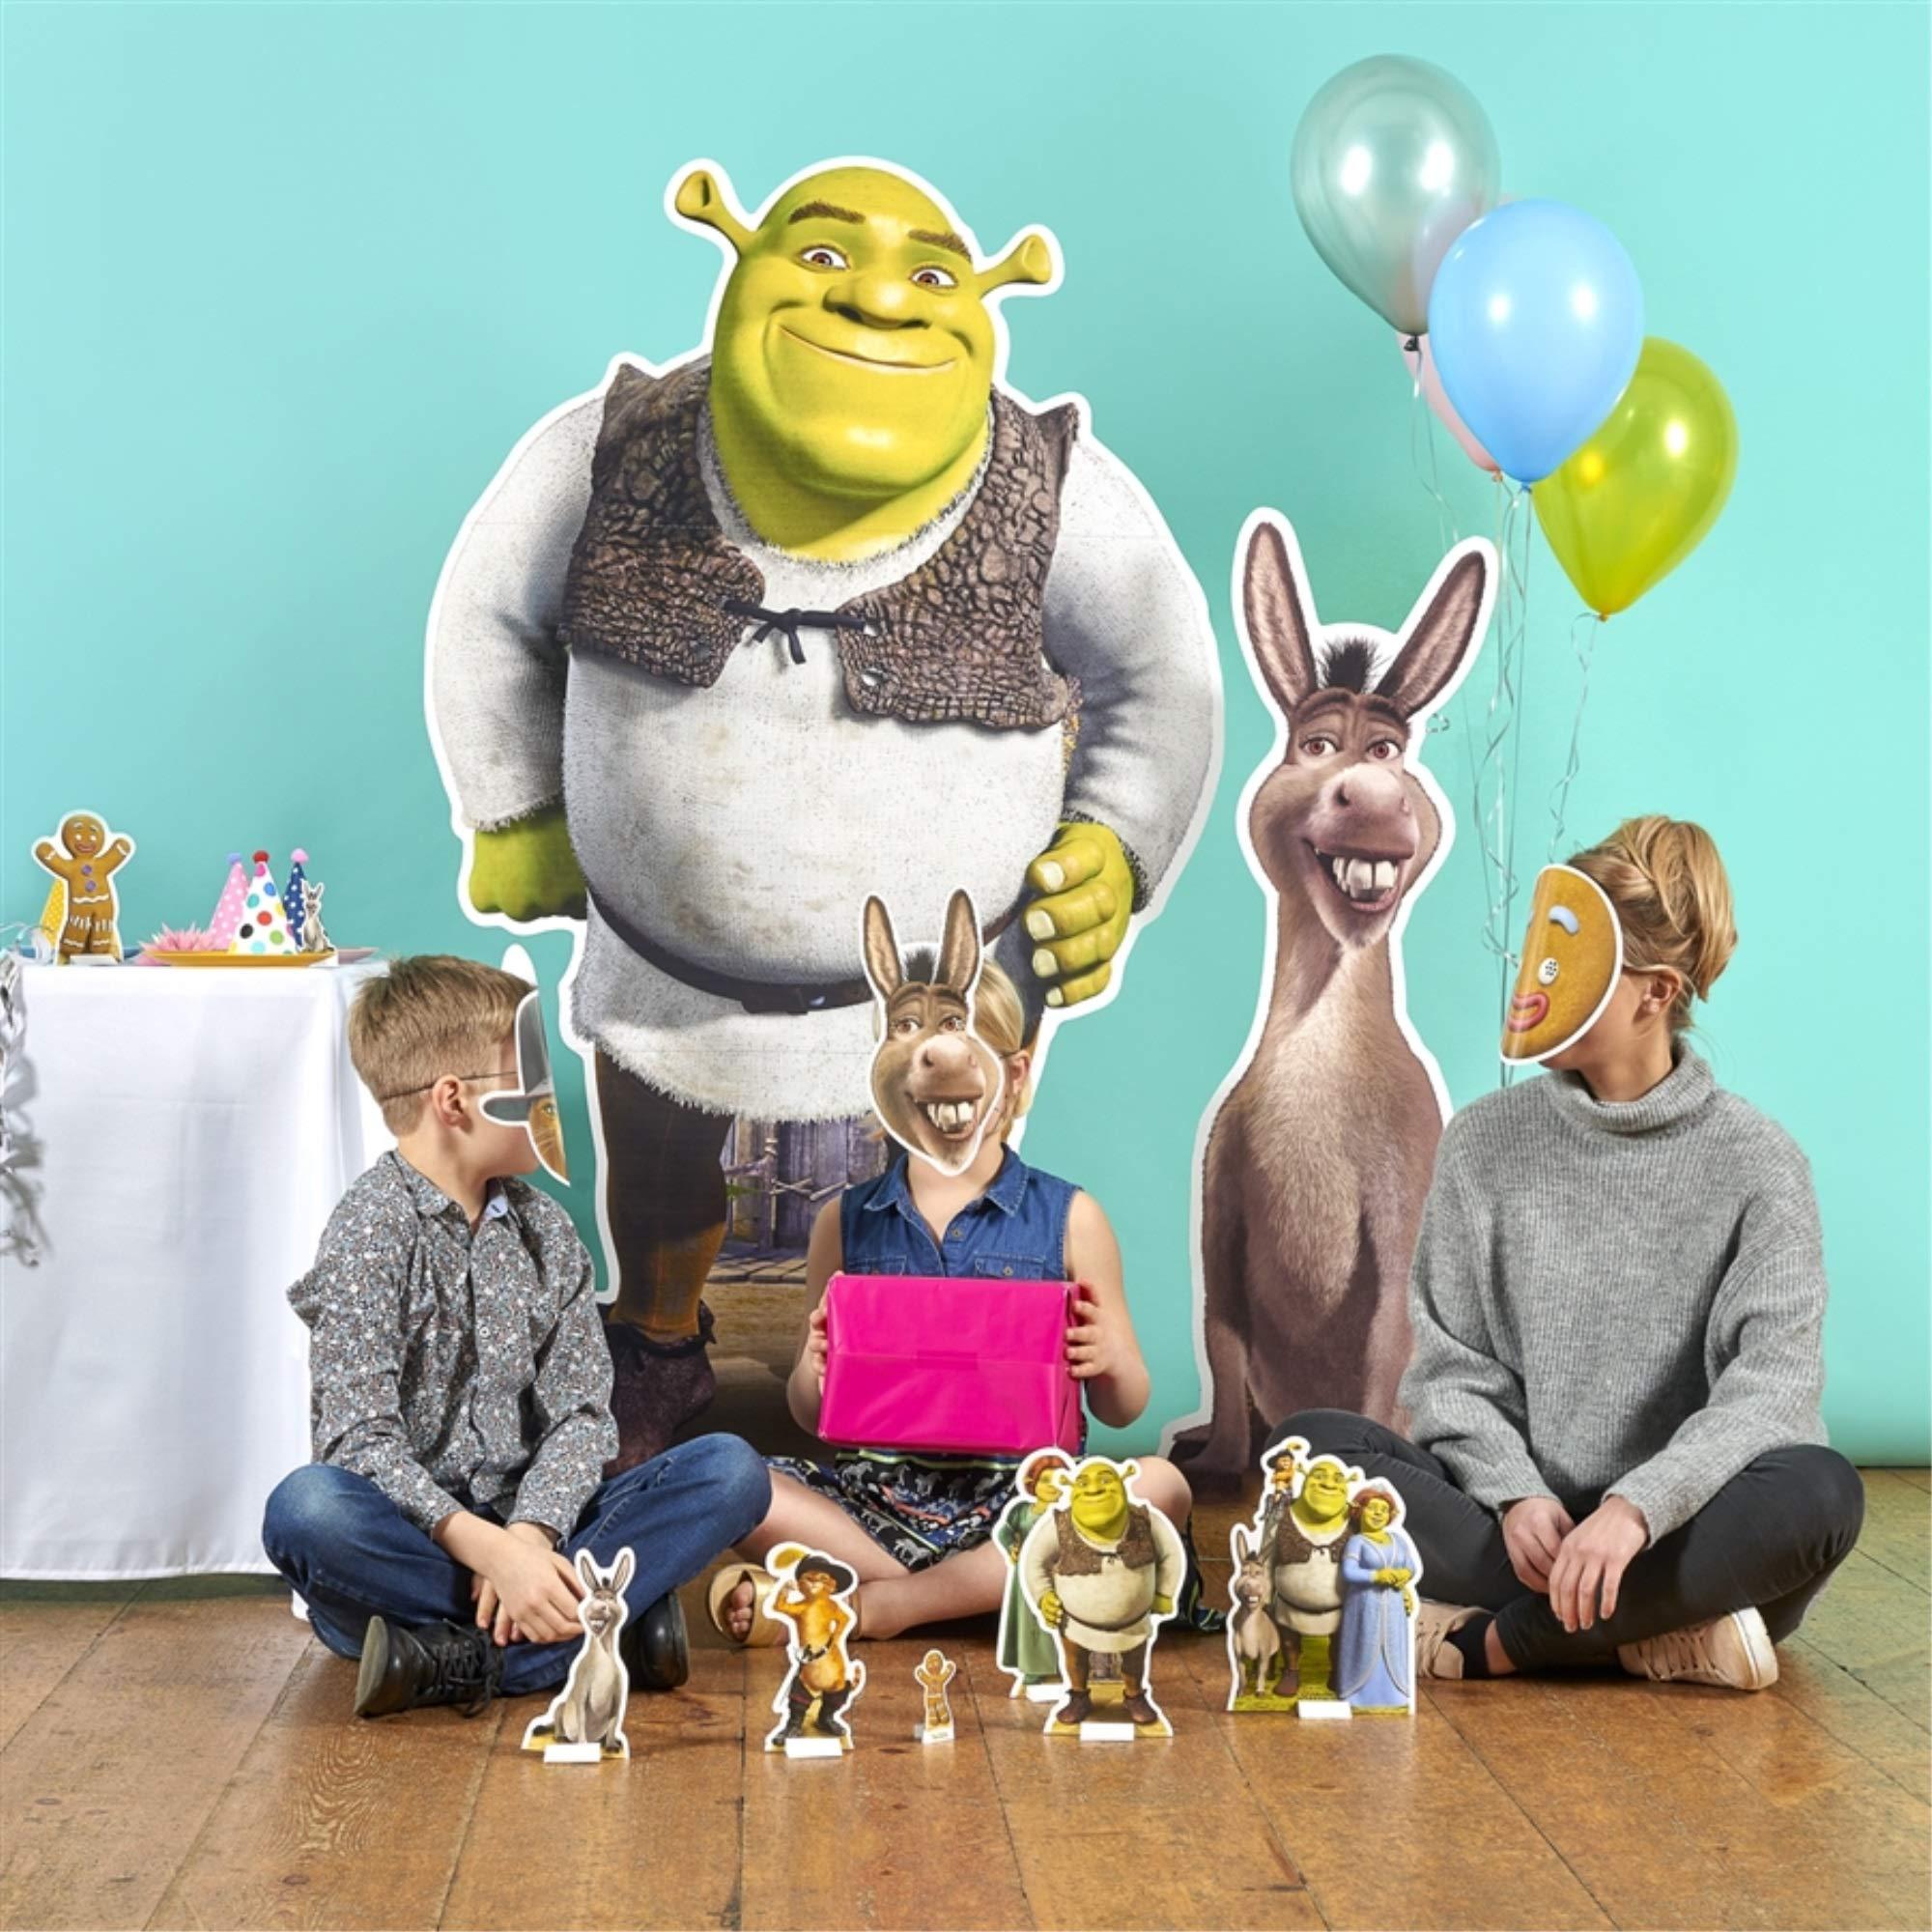 Star Cutouts, Shrek, Life-Size Cardboard Cutout Standup - 67 x 37 inches by Star Cutouts